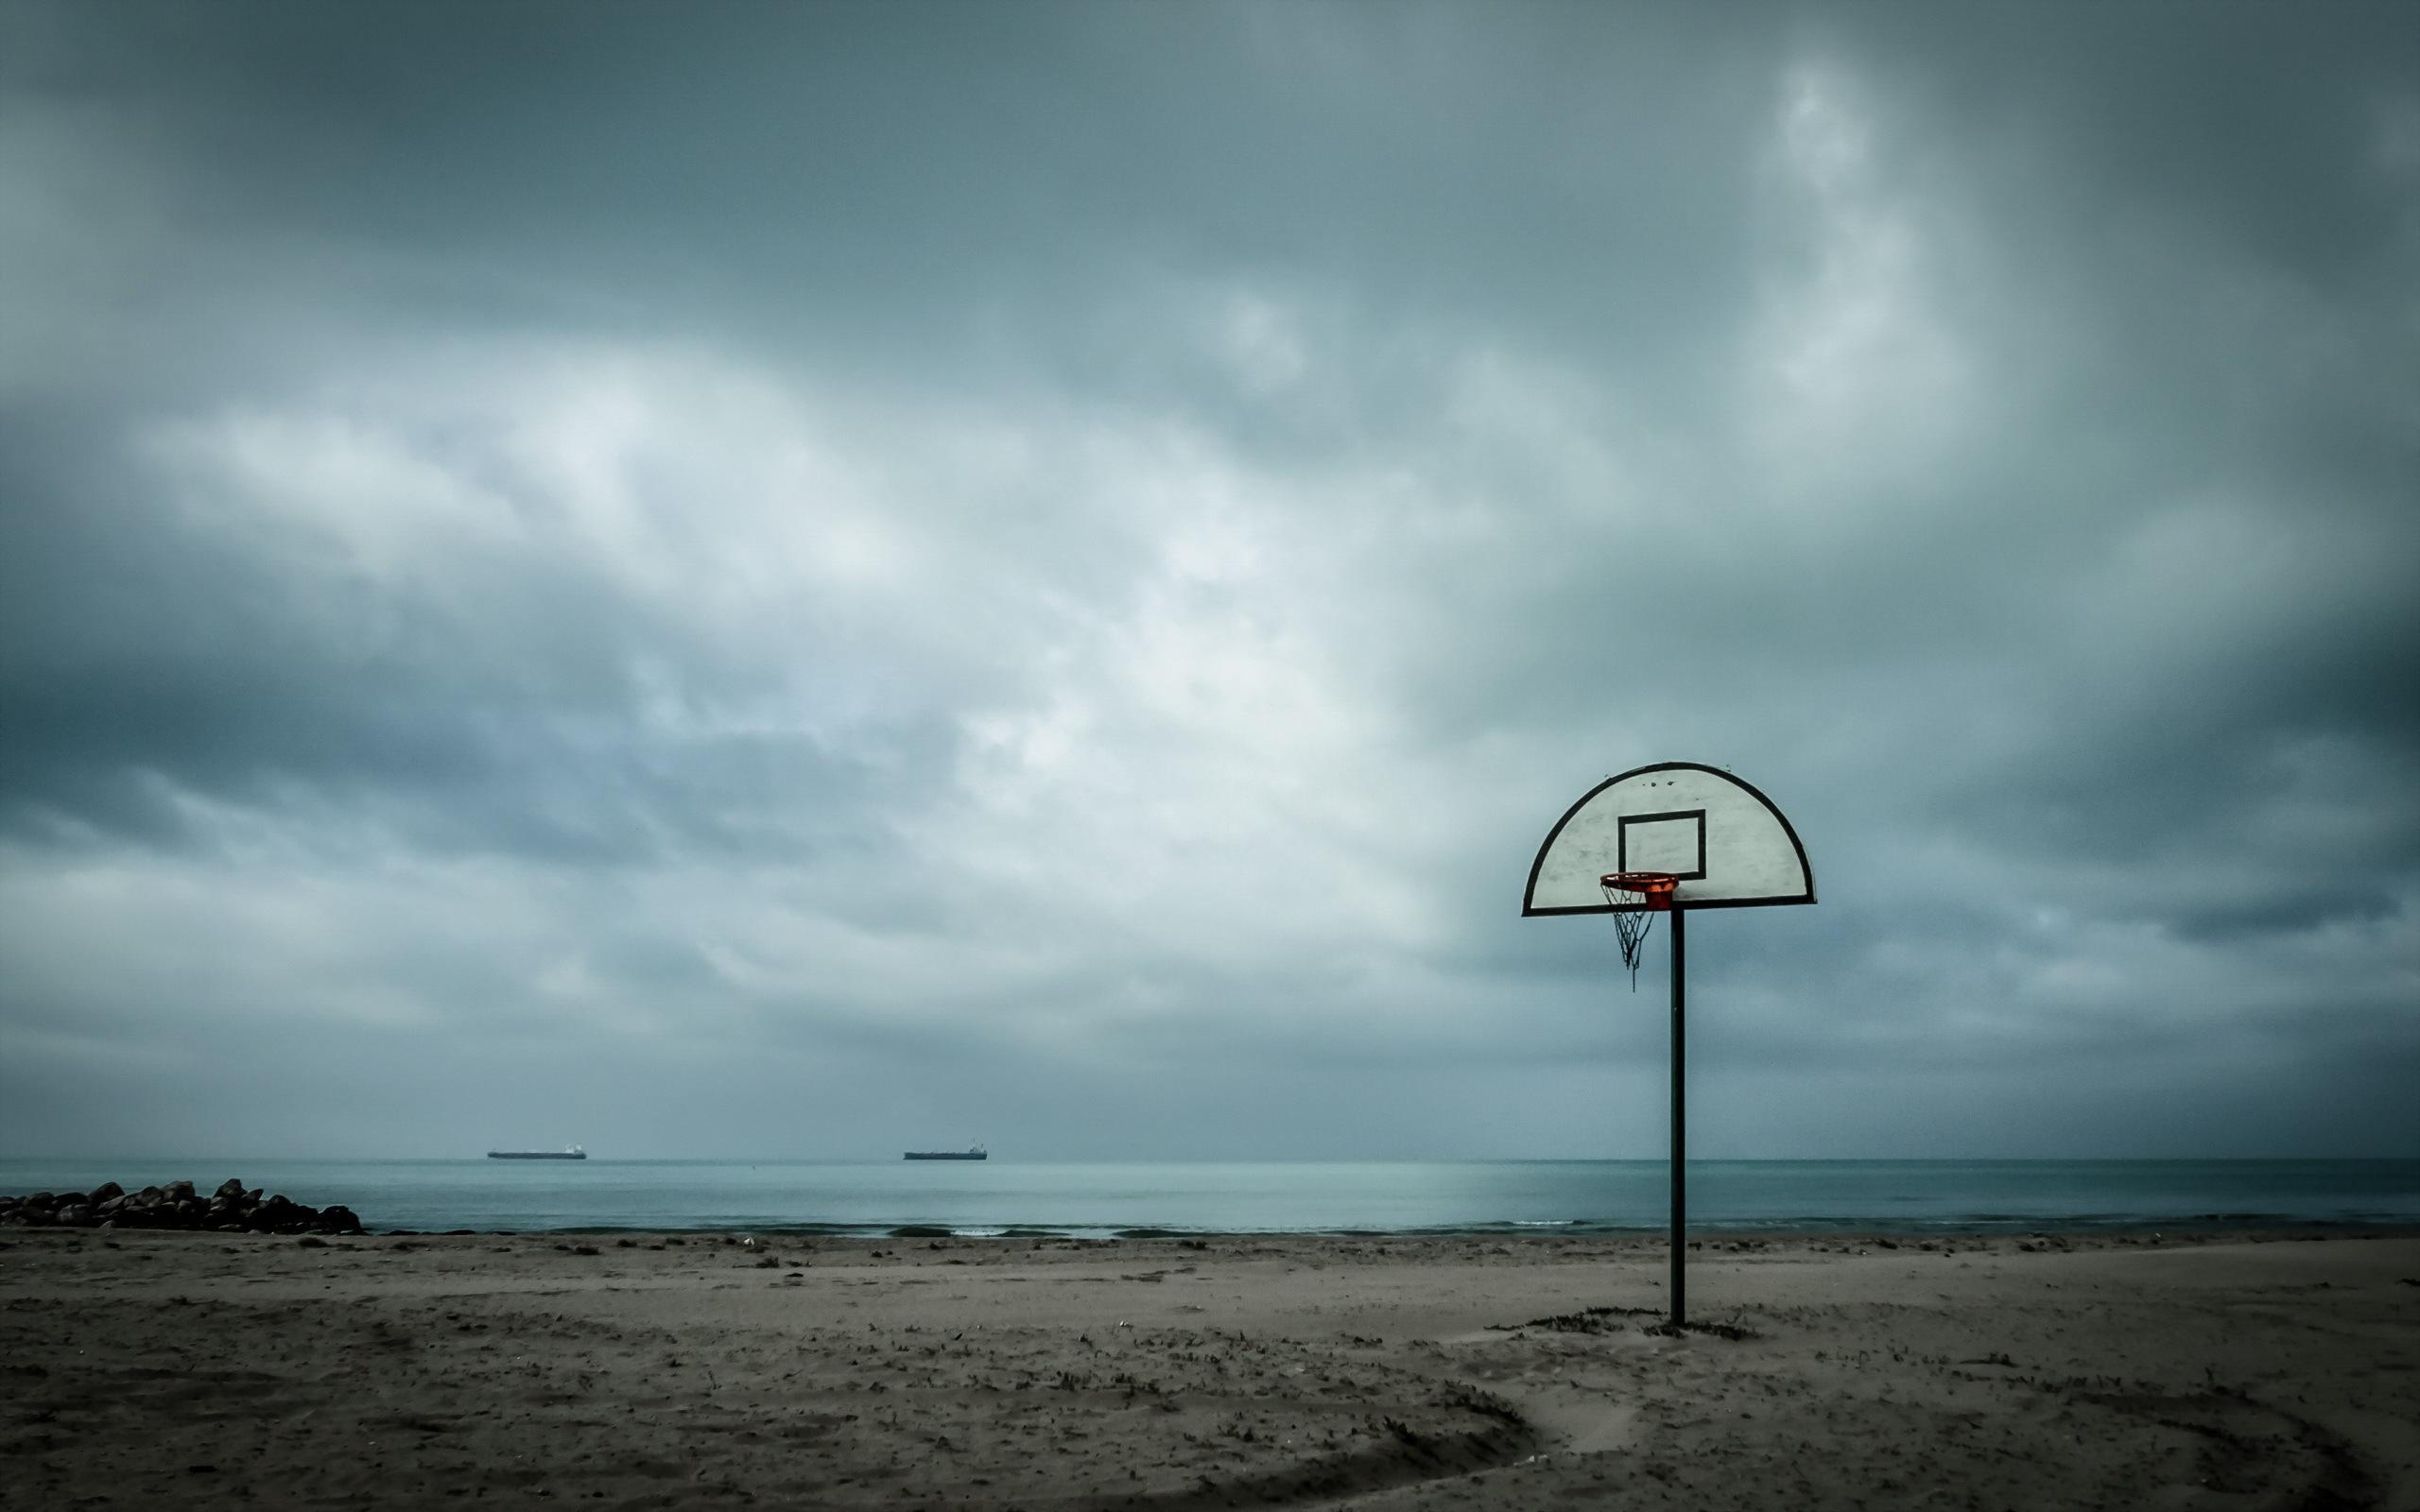 Basketball Court In Beach Wallpaper Power Of Sports